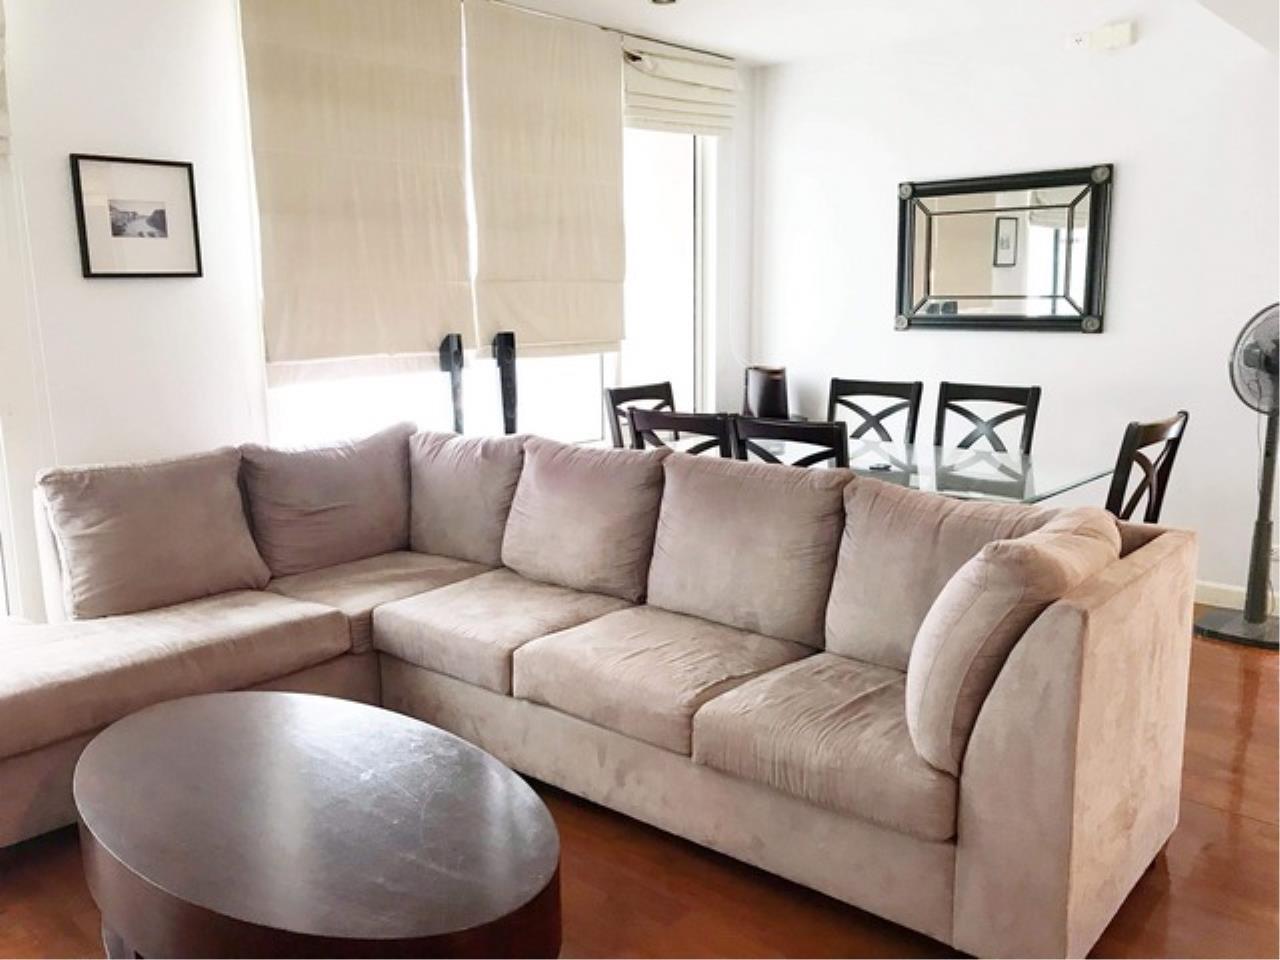 Ta (+66 9 5935 1592) Agency's SALE Condo Siri Residence by Sansiri 2 Bed near BTS Prompong Thonglor Emporium Best Price (163,000B/sqm) 1